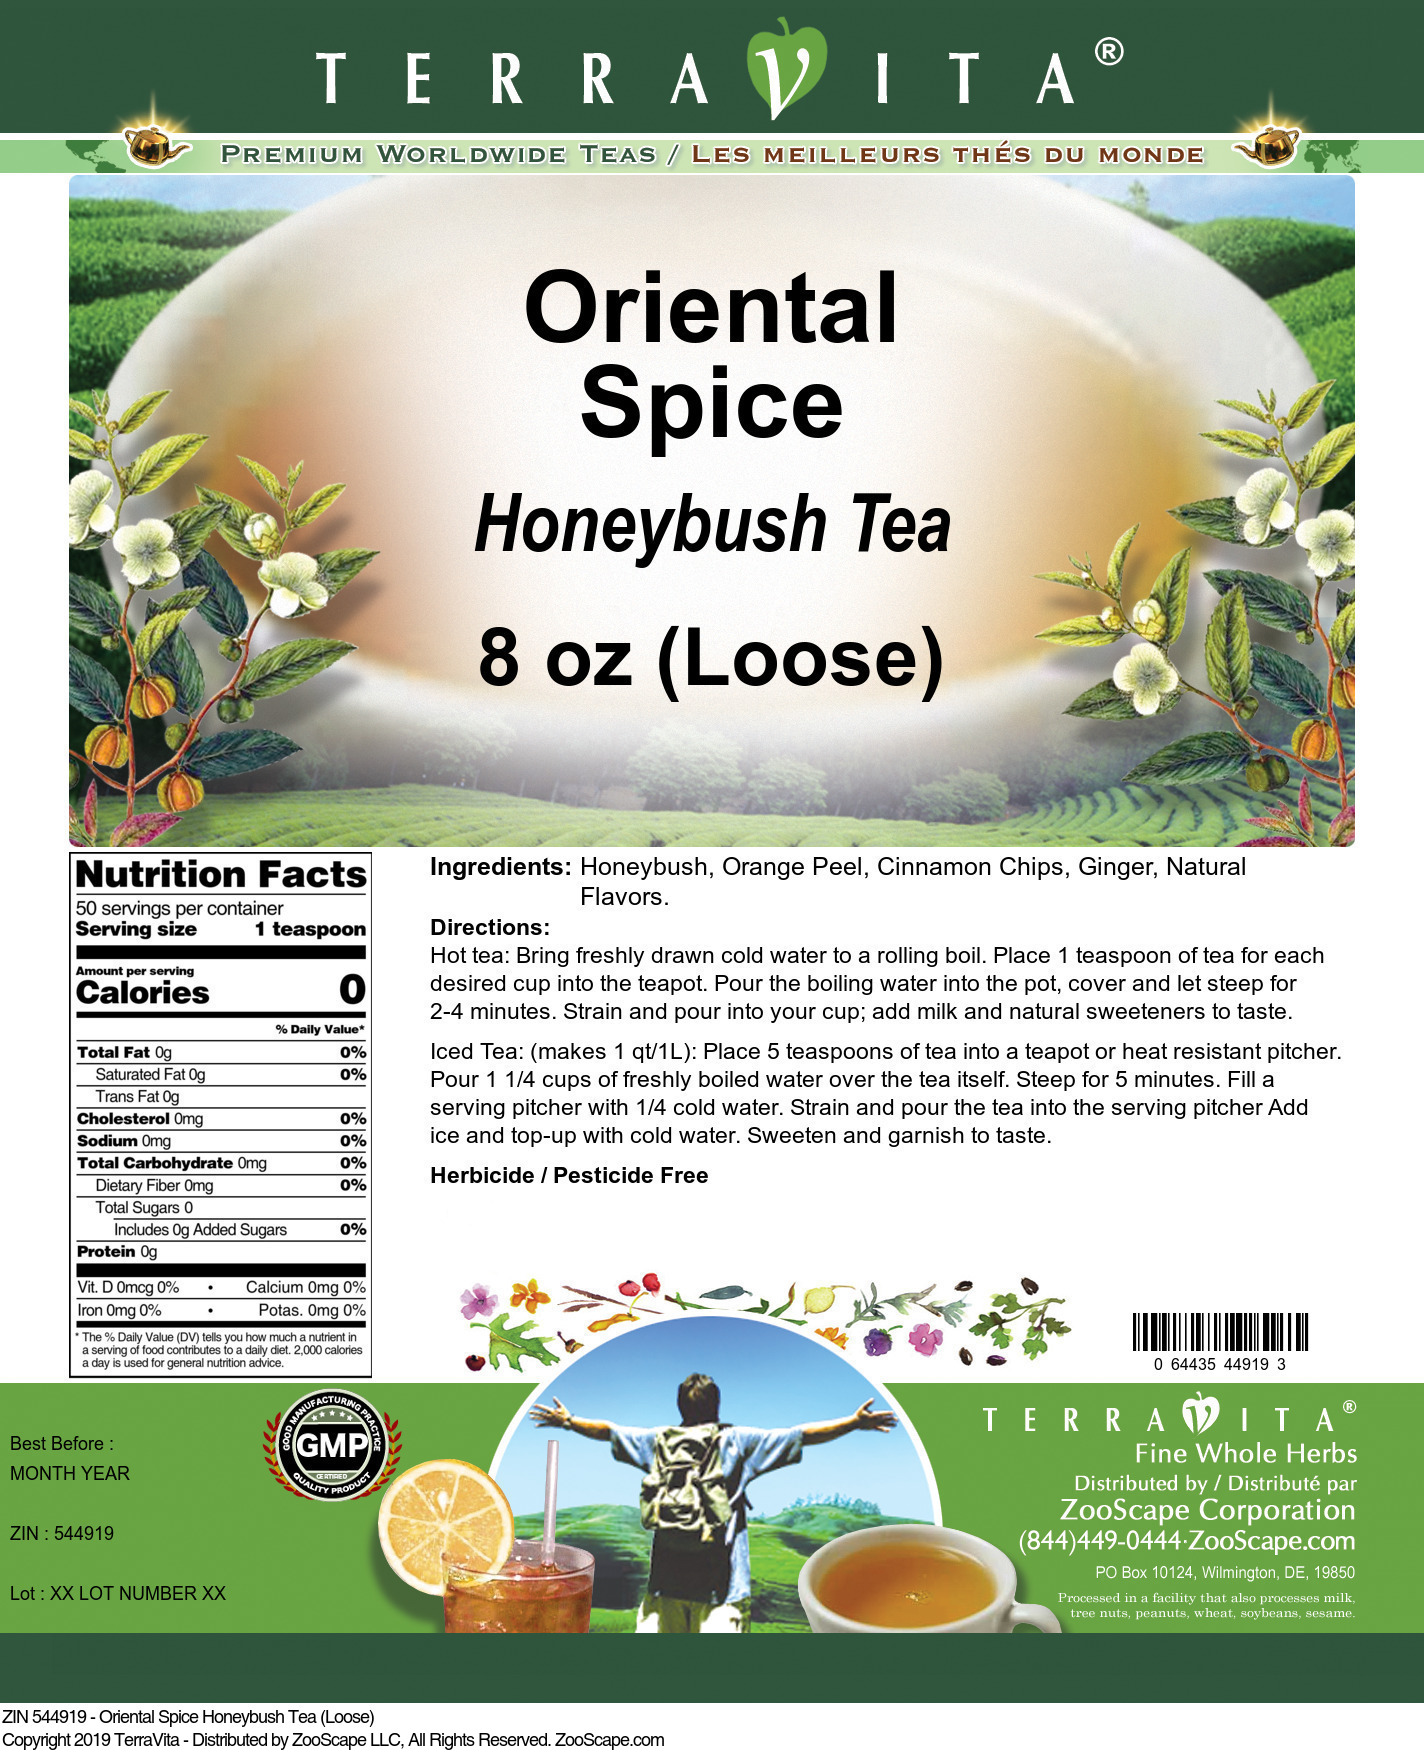 Oriental Spice Honeybush Tea (Loose)